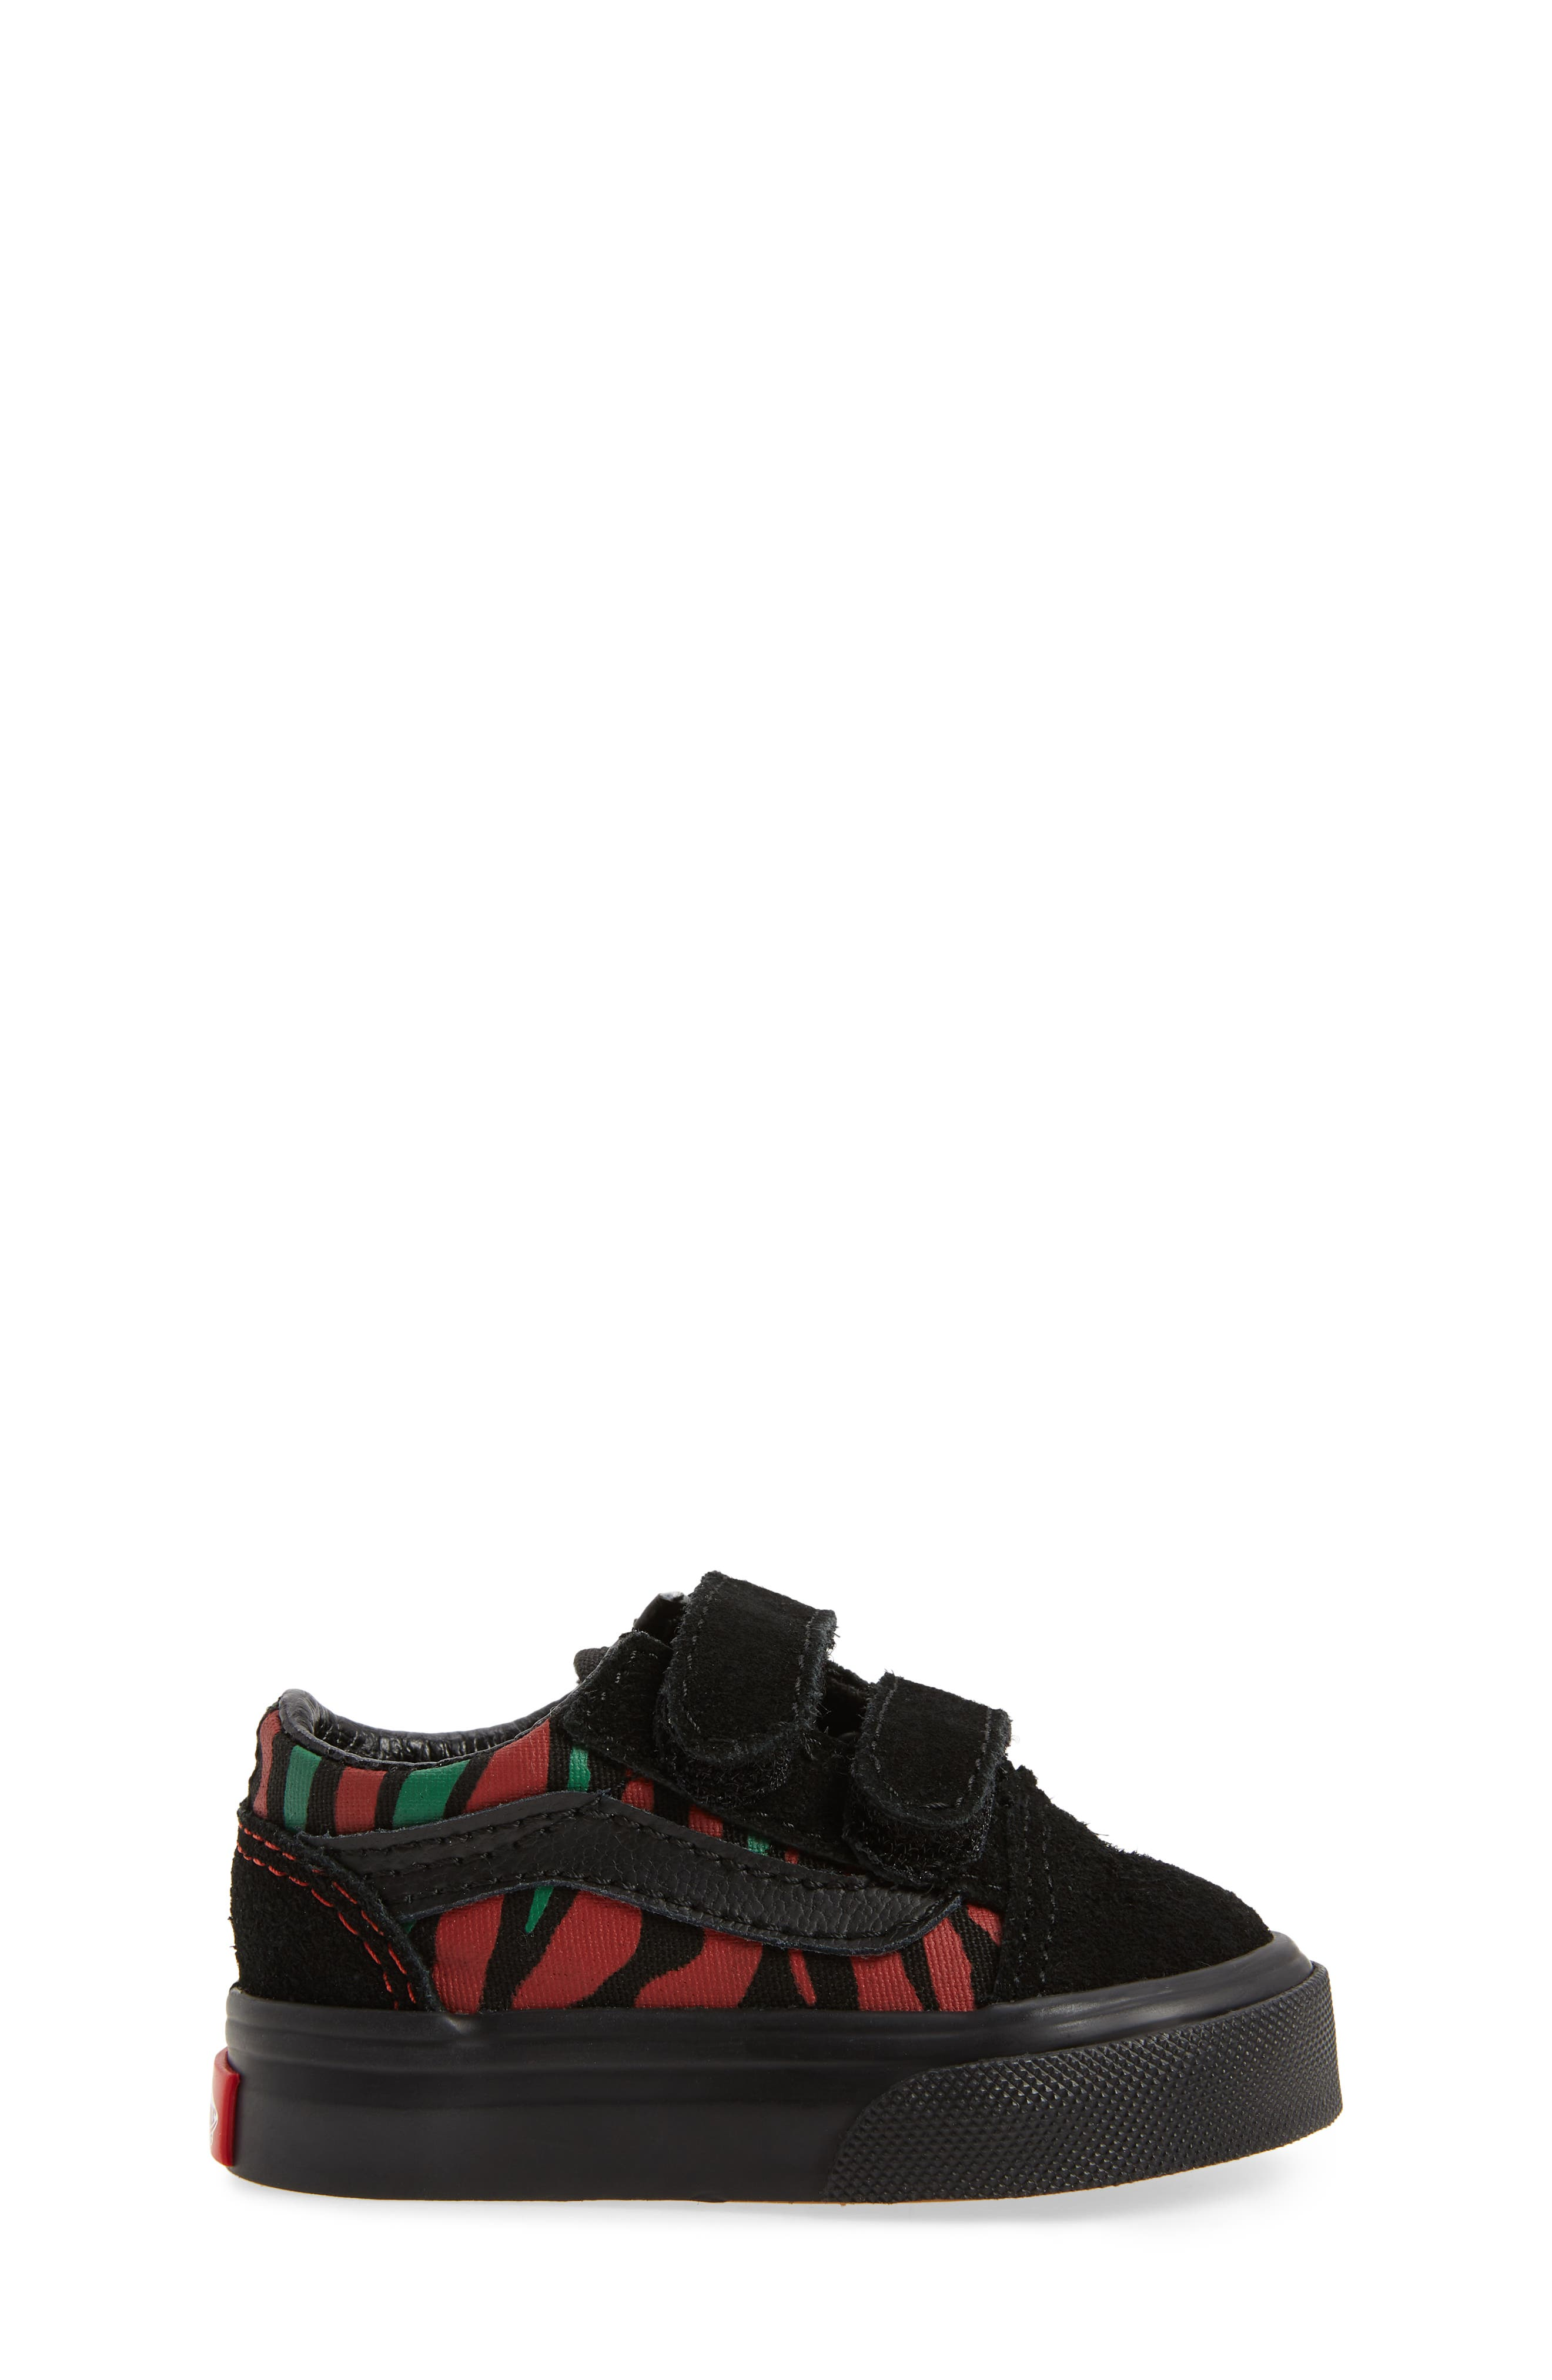 Old Skool V Sneaker,                             Alternate thumbnail 3, color,                             Black